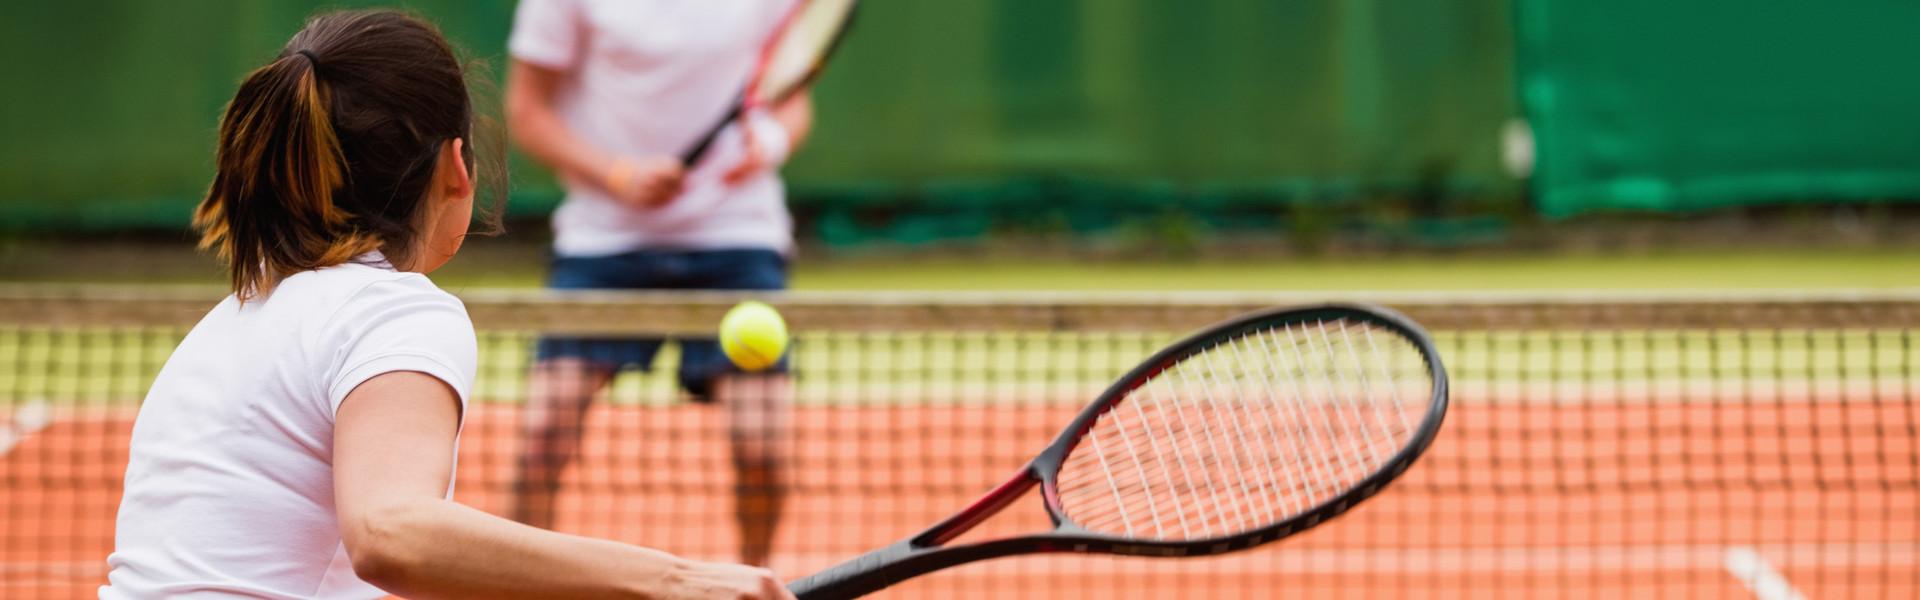 Tennis at our Las Vegas Hotel and Casino   Las Vegas Tennis